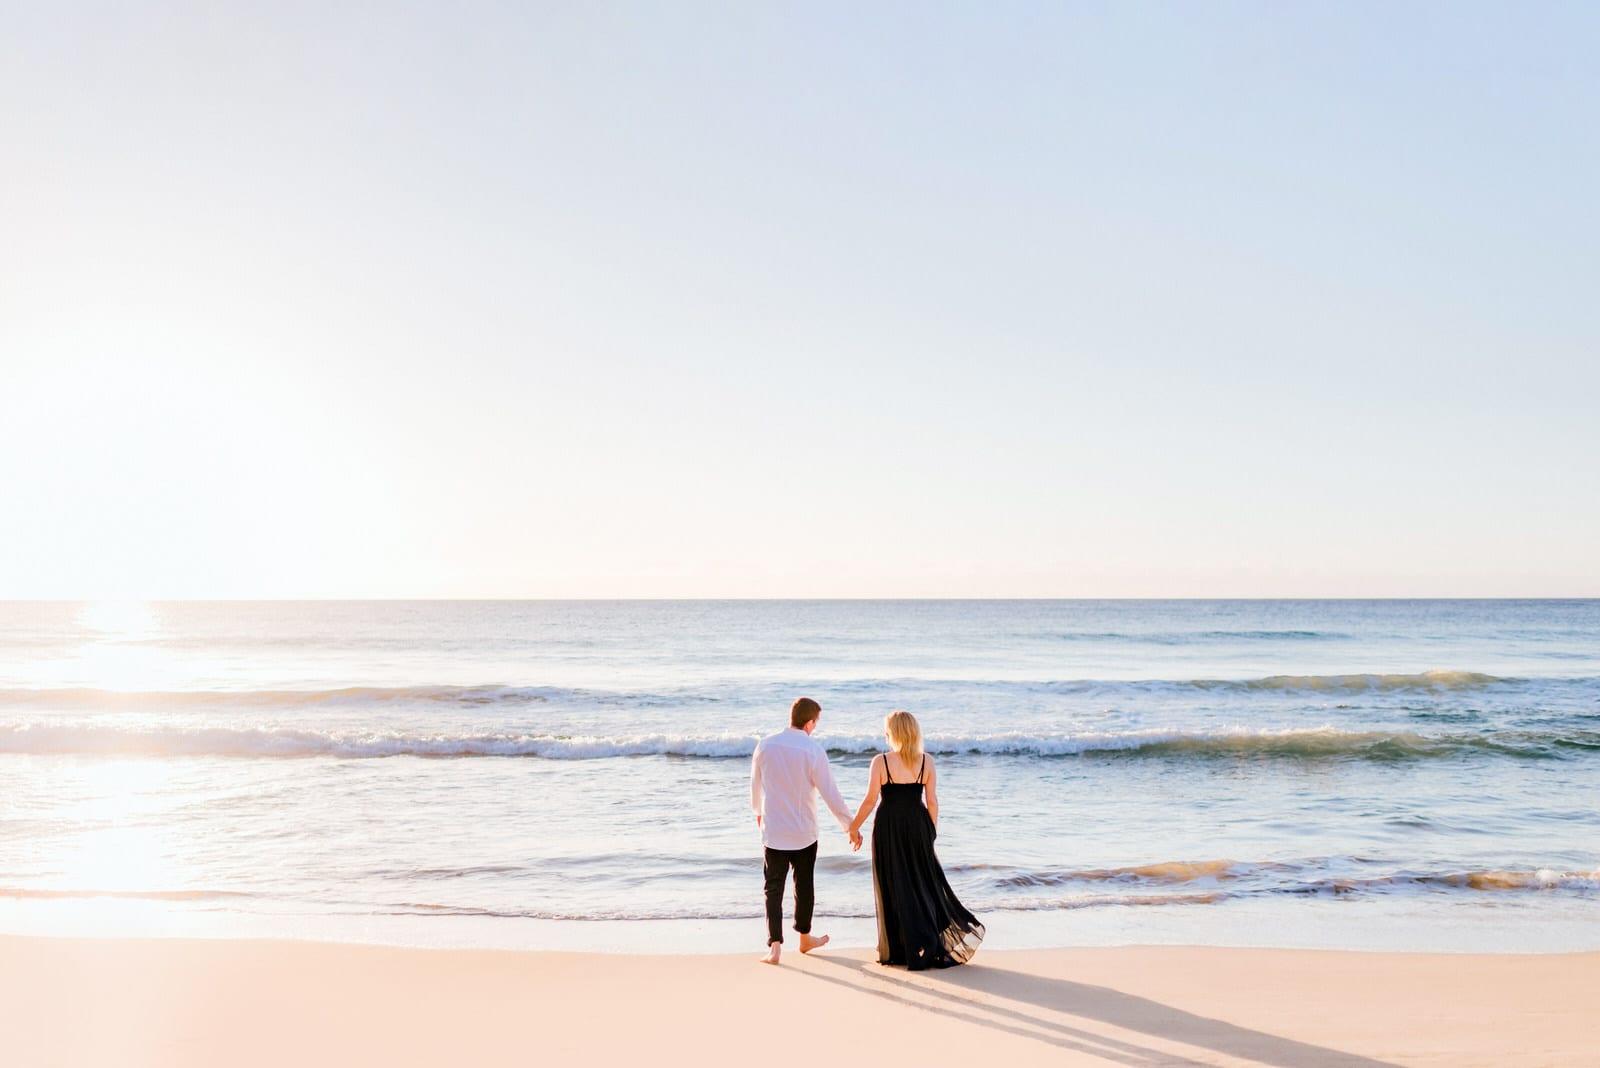 kona-engagement-photographer-navy-dress-sunset-6.jpg